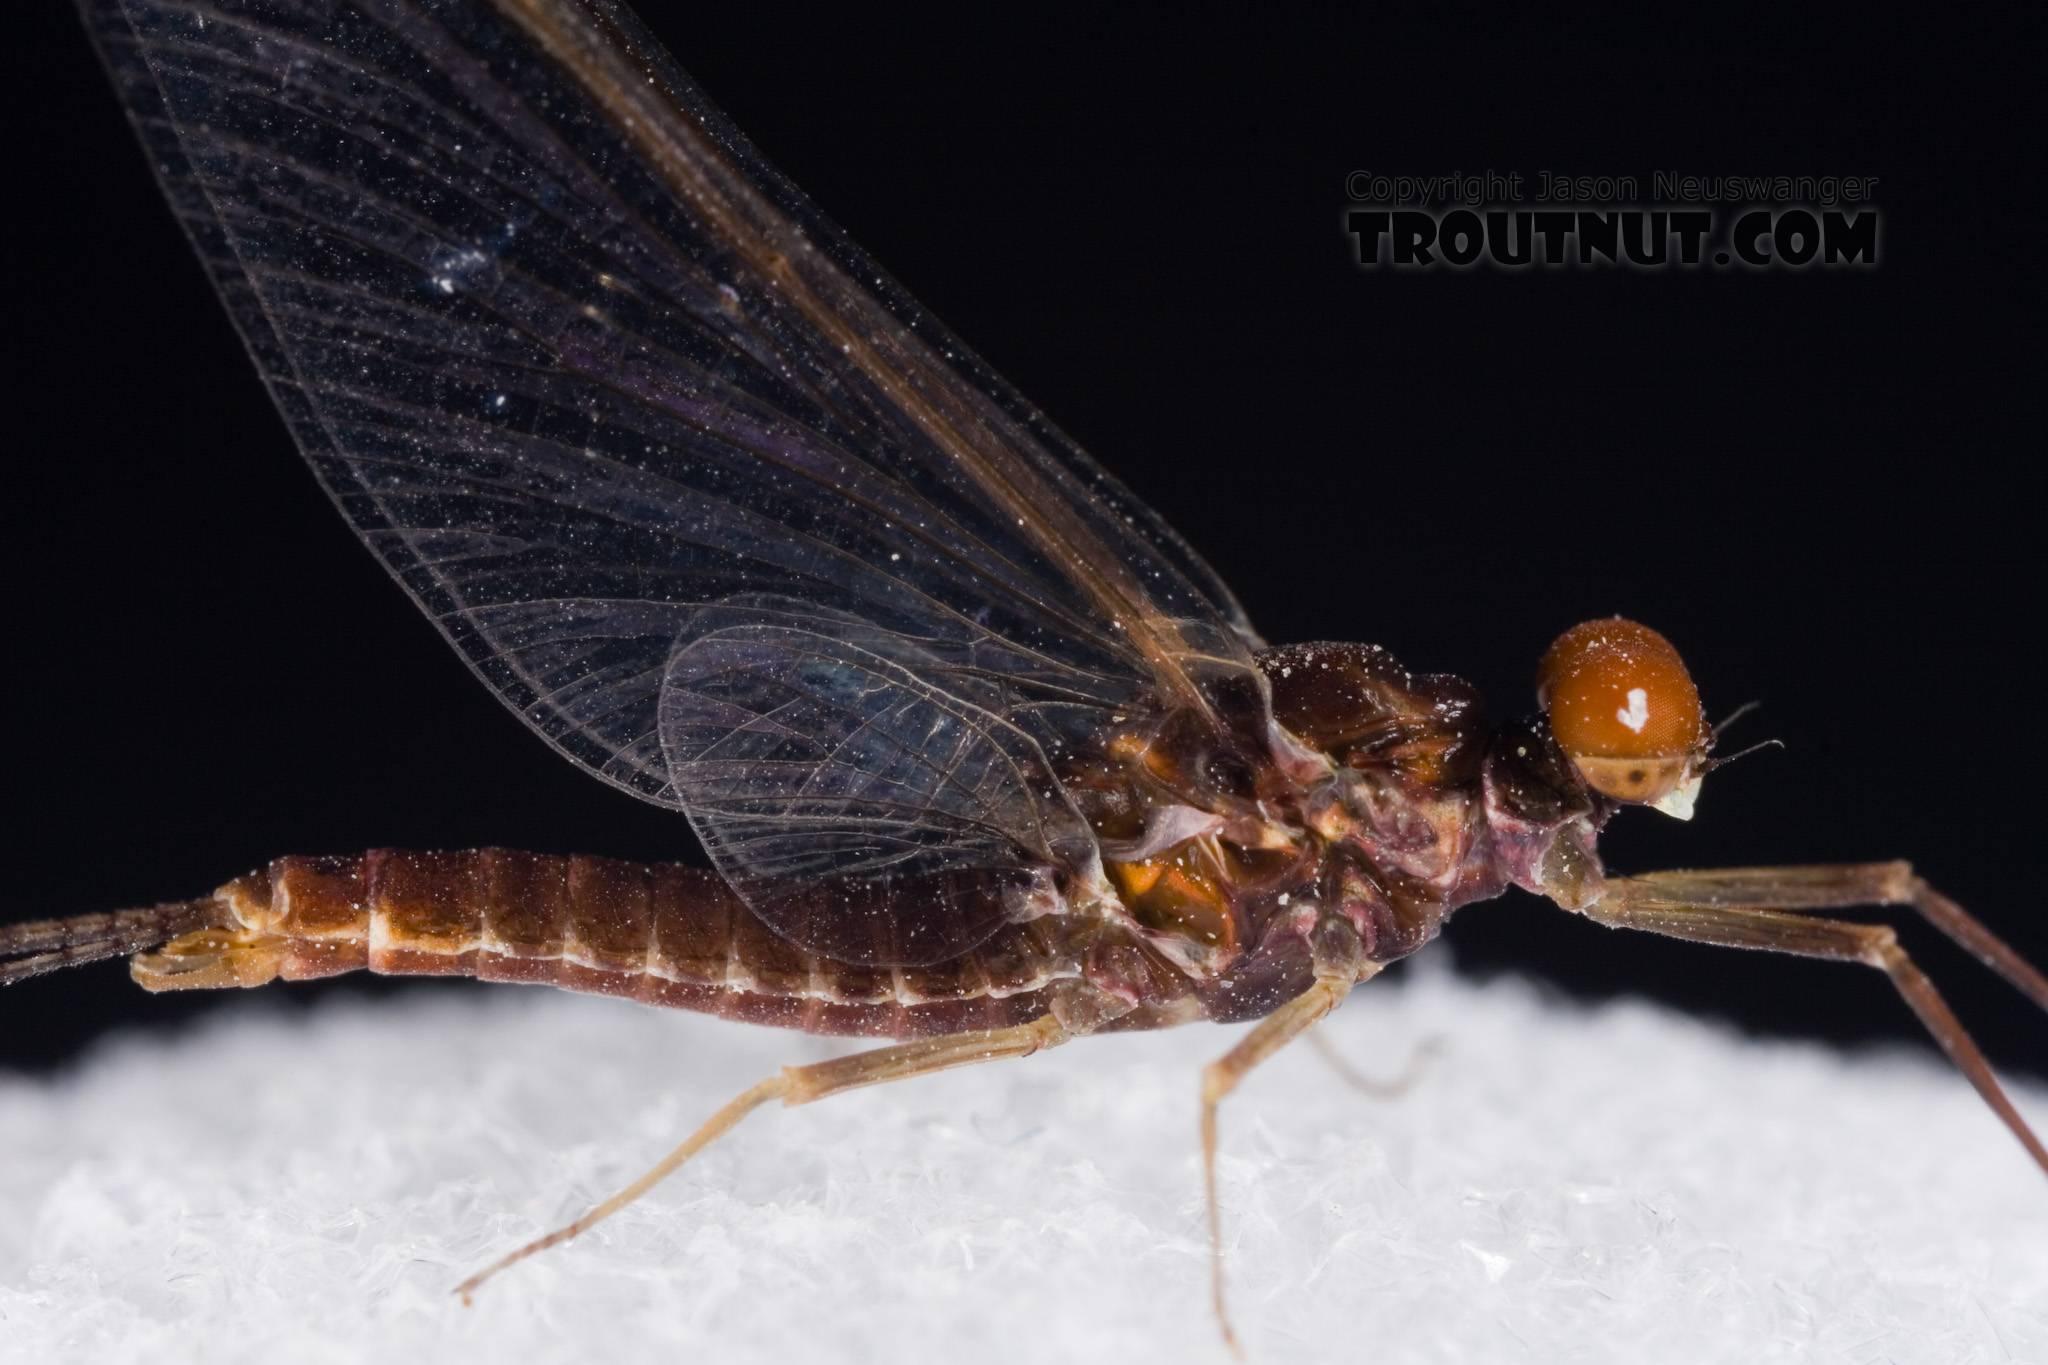 Male Ephemerella subvaria (Hendrickson) Mayfly Spinner from Fall Creek in New York